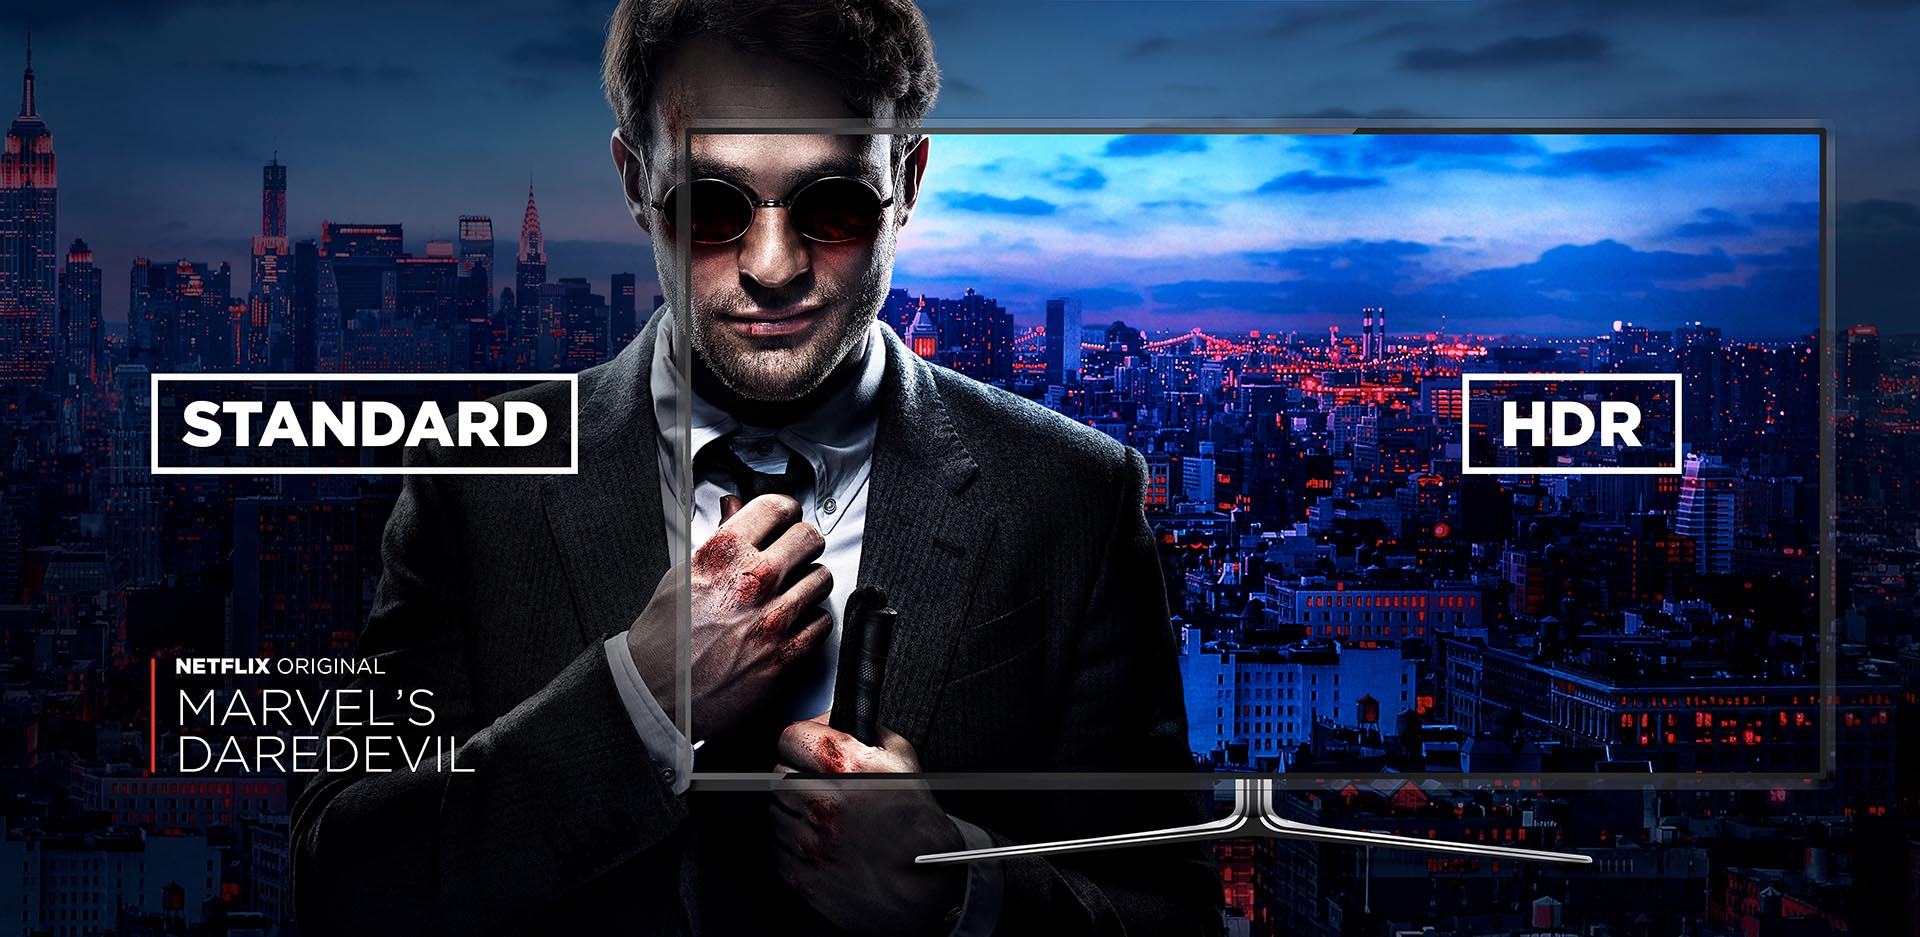 Netflix Hdr Sverige